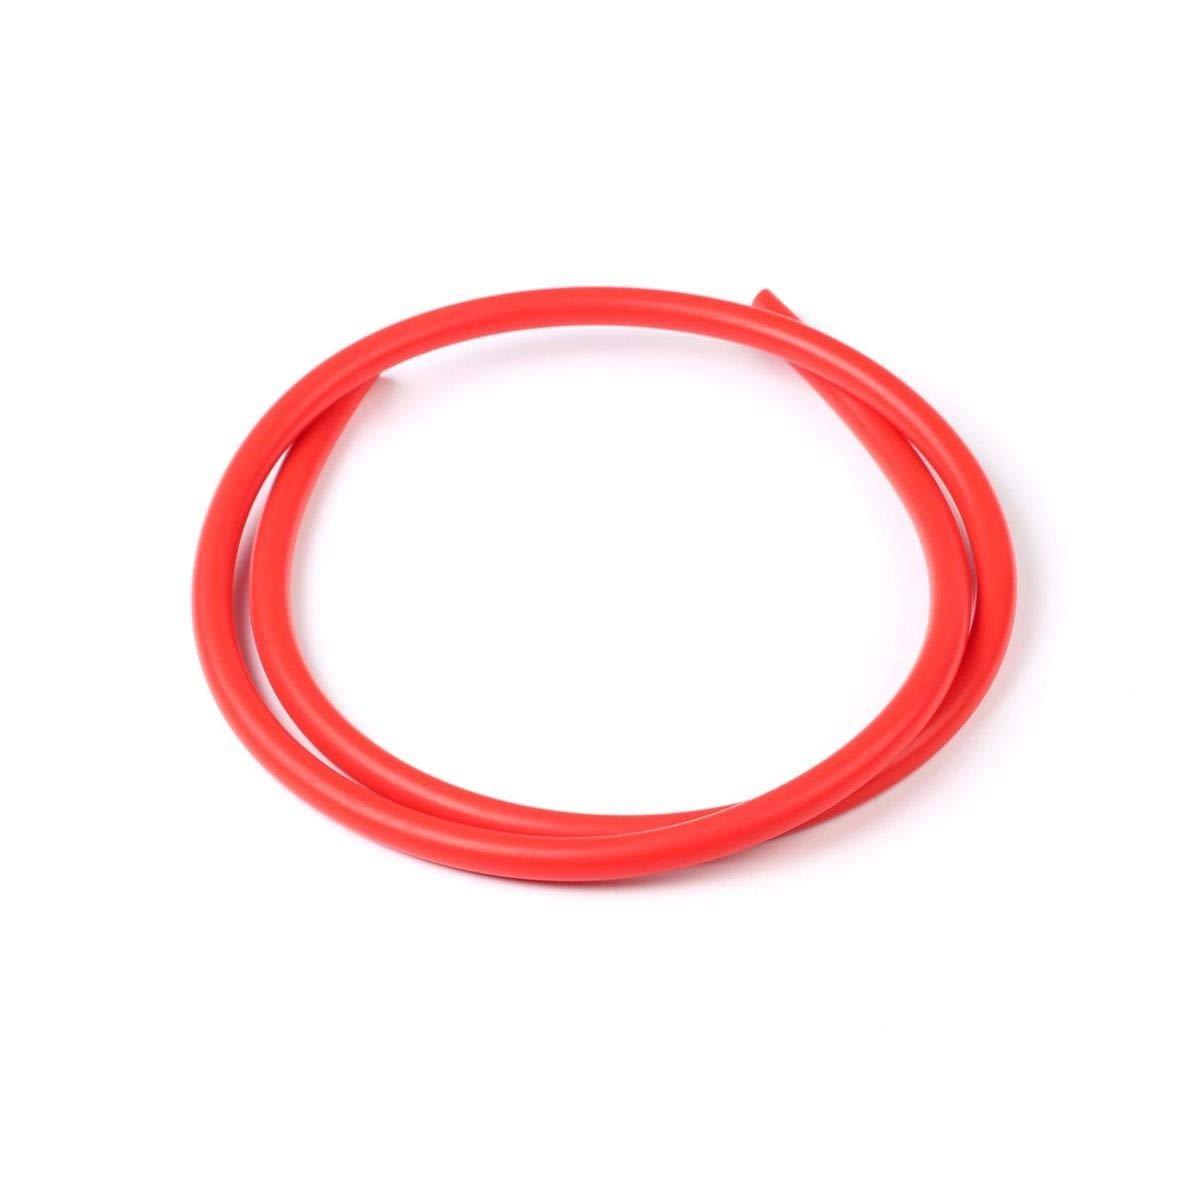 KapOD Red ID:1/4'' 0.25'' (6MM) Silicone Vacuum Hose Tube Pipe Racing Turbo 1 Foot by KapOD (Image #1)